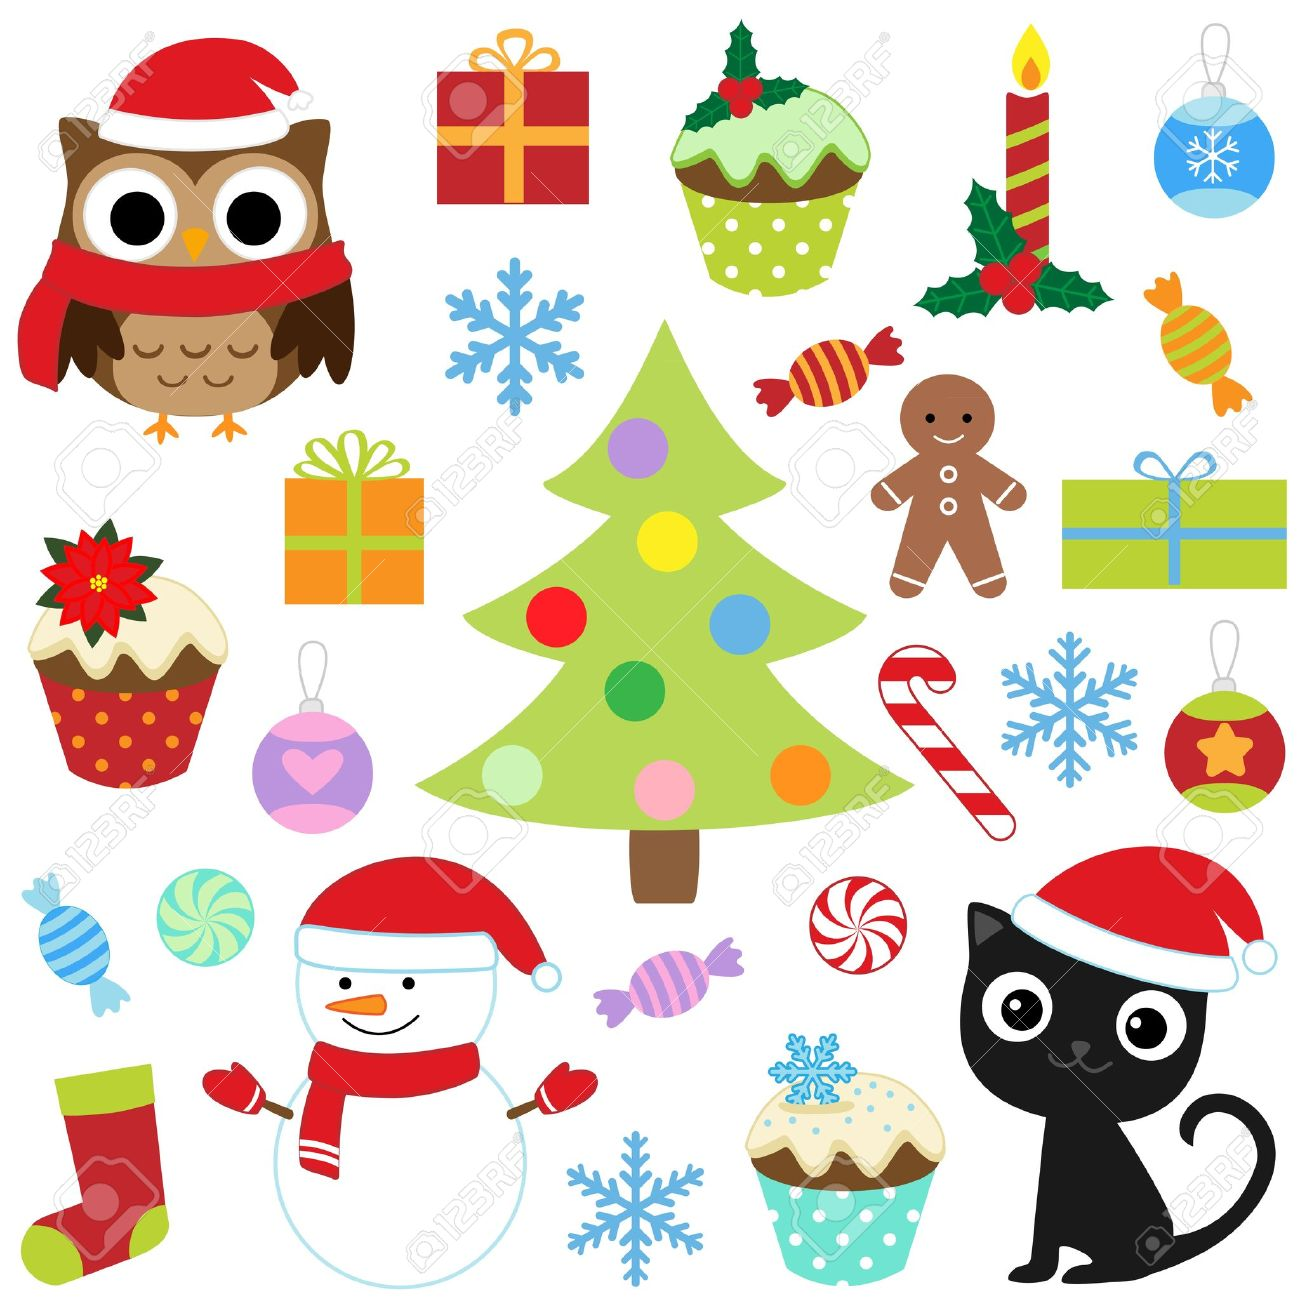 Christmas Vector Cute Elements Set Royalty Free Cliparts, Vectors ...